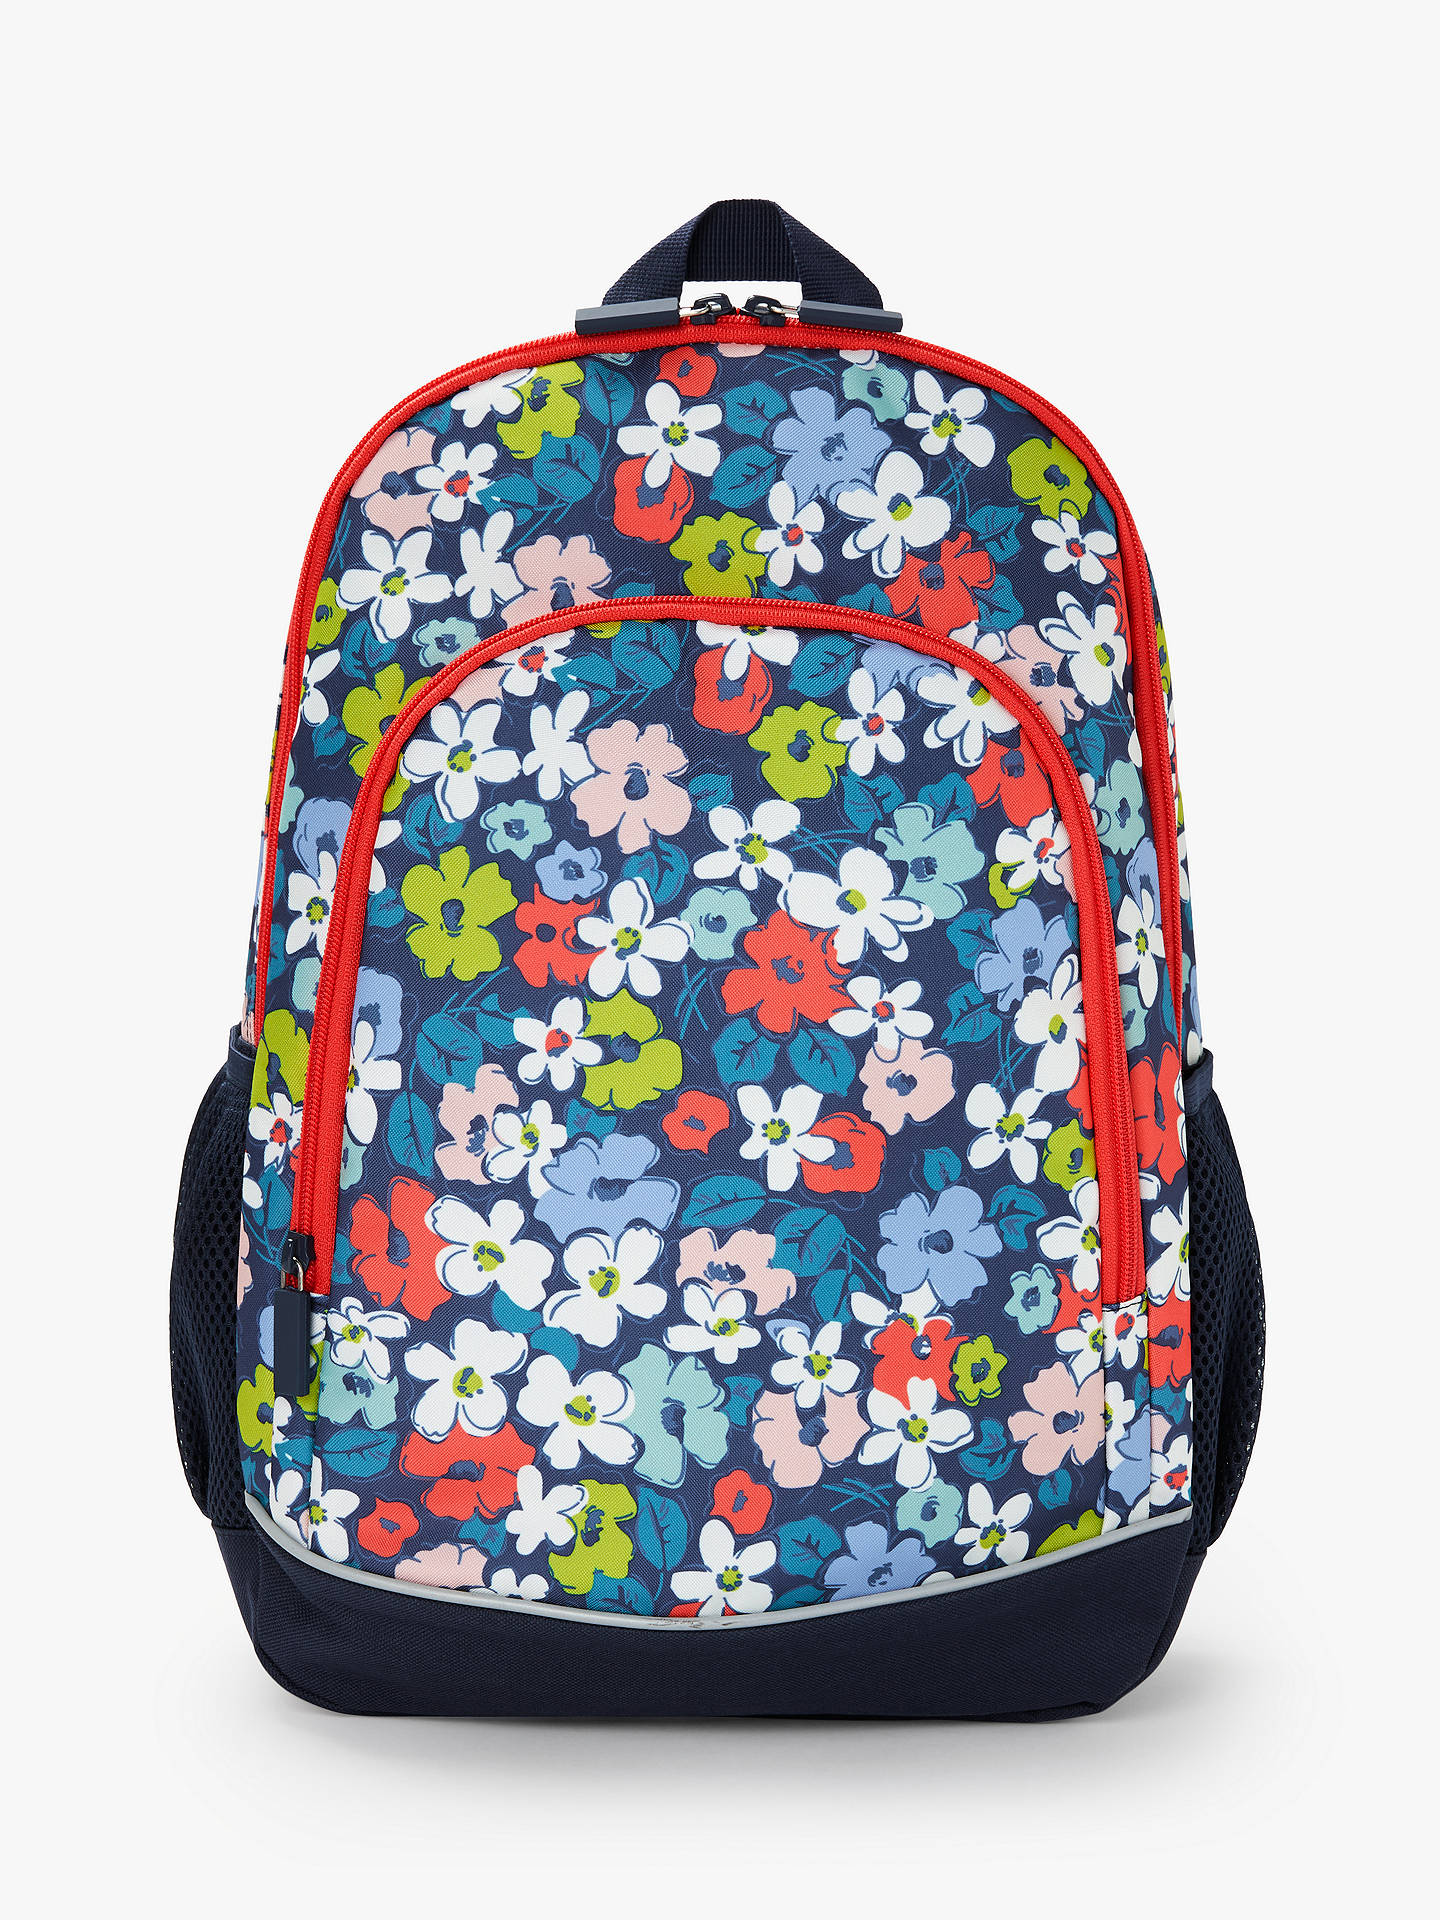 915c349ab8 Buy John Lewis & Partners Floral Children's Backpack Online at johnlewis.  ...